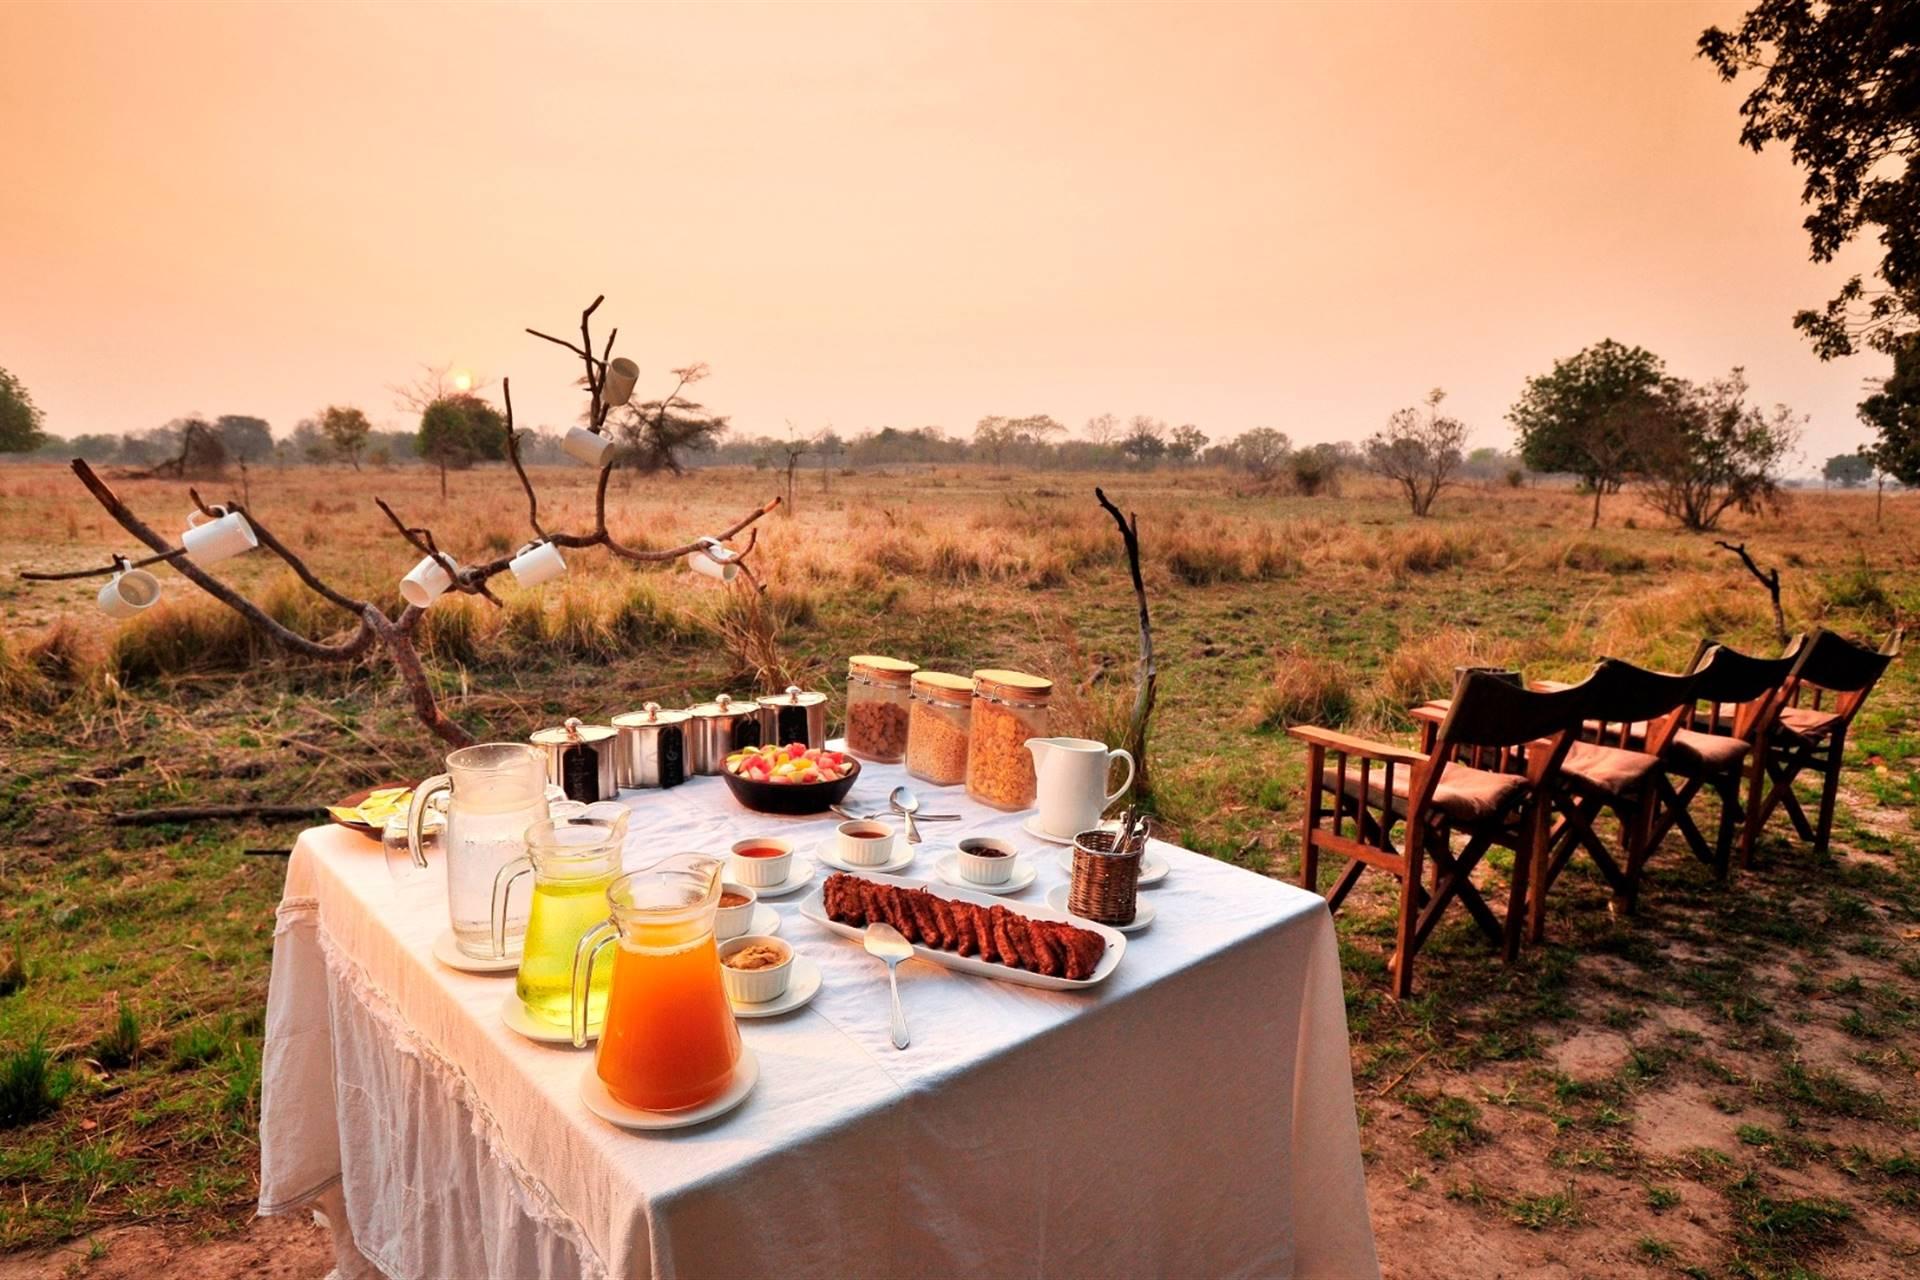 Breakfast in the bush - Luwi Bush Camp - South Luangwa, Zambia